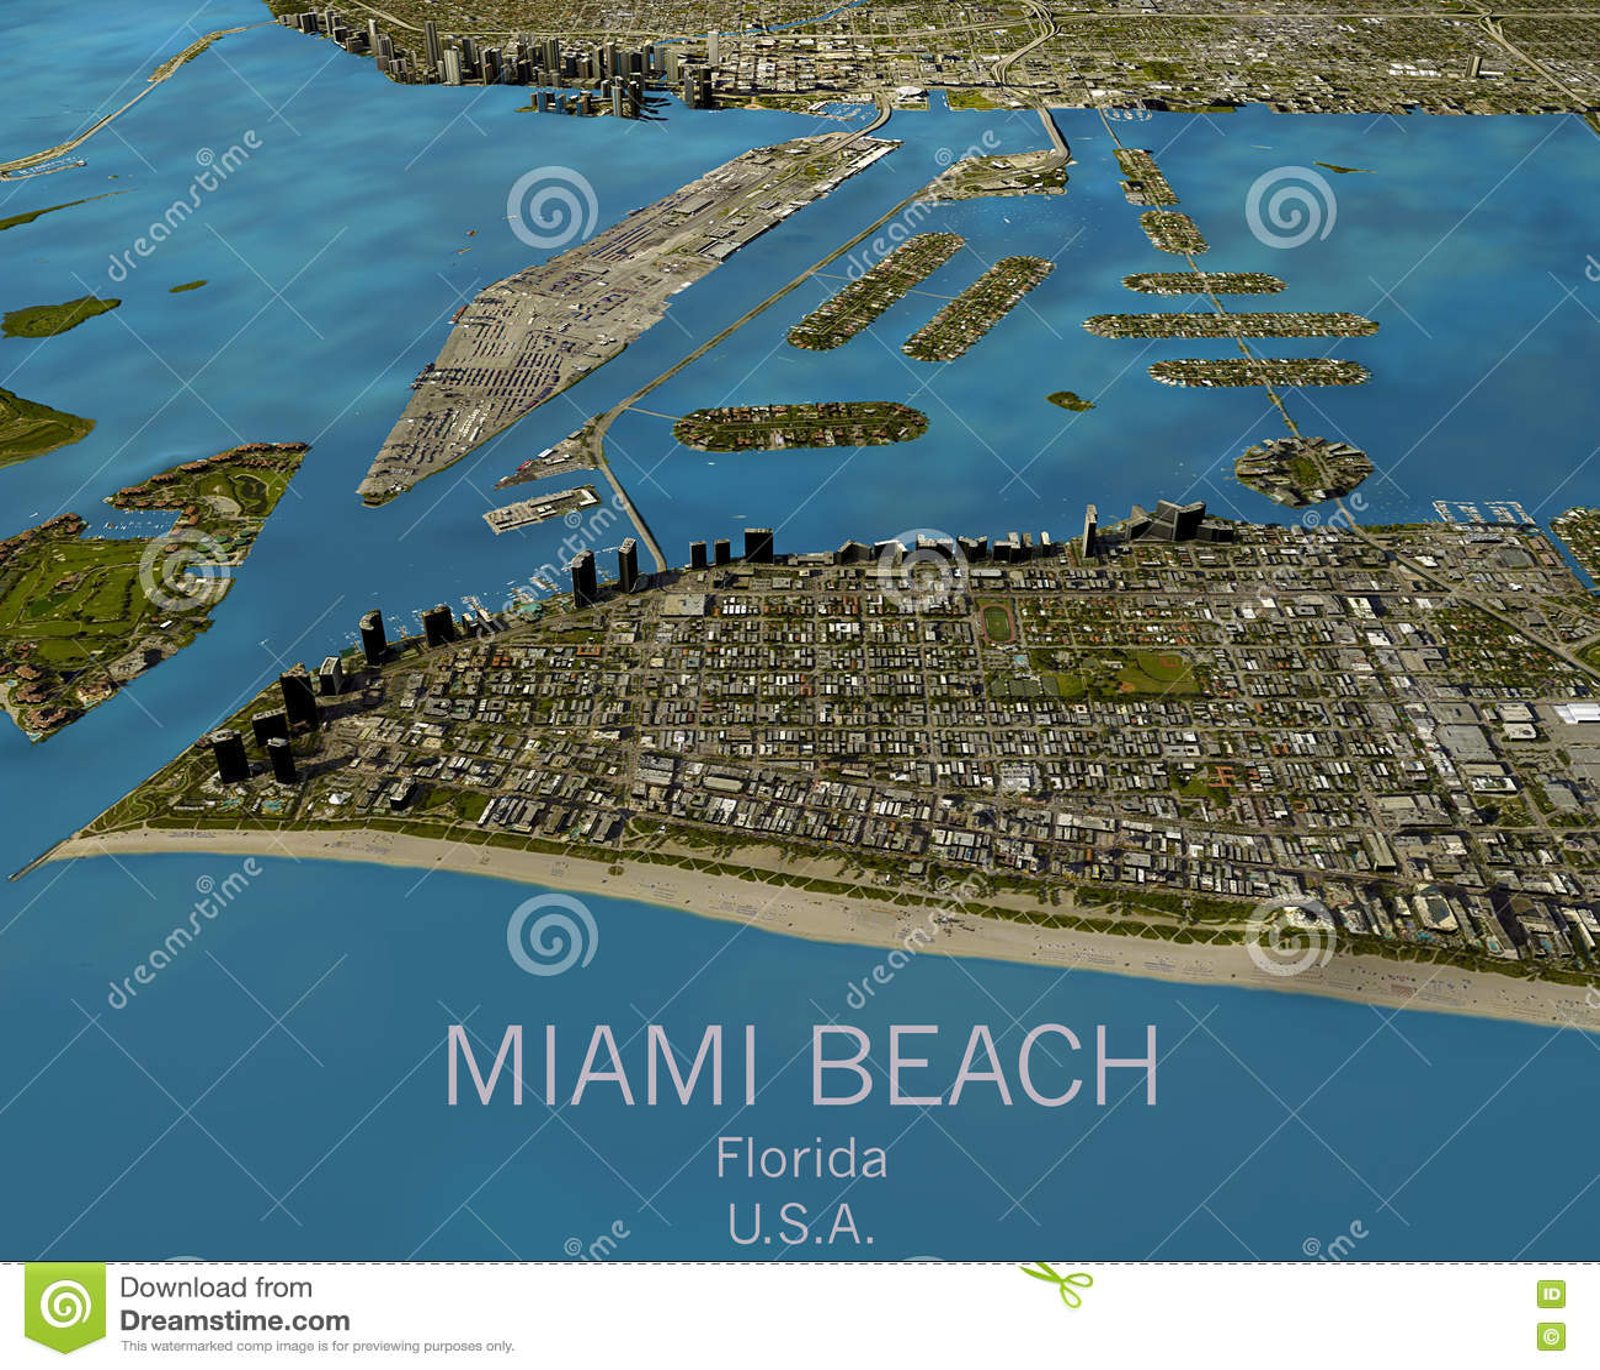 mapa de miami, vista satélite, estados unidos foto de stock